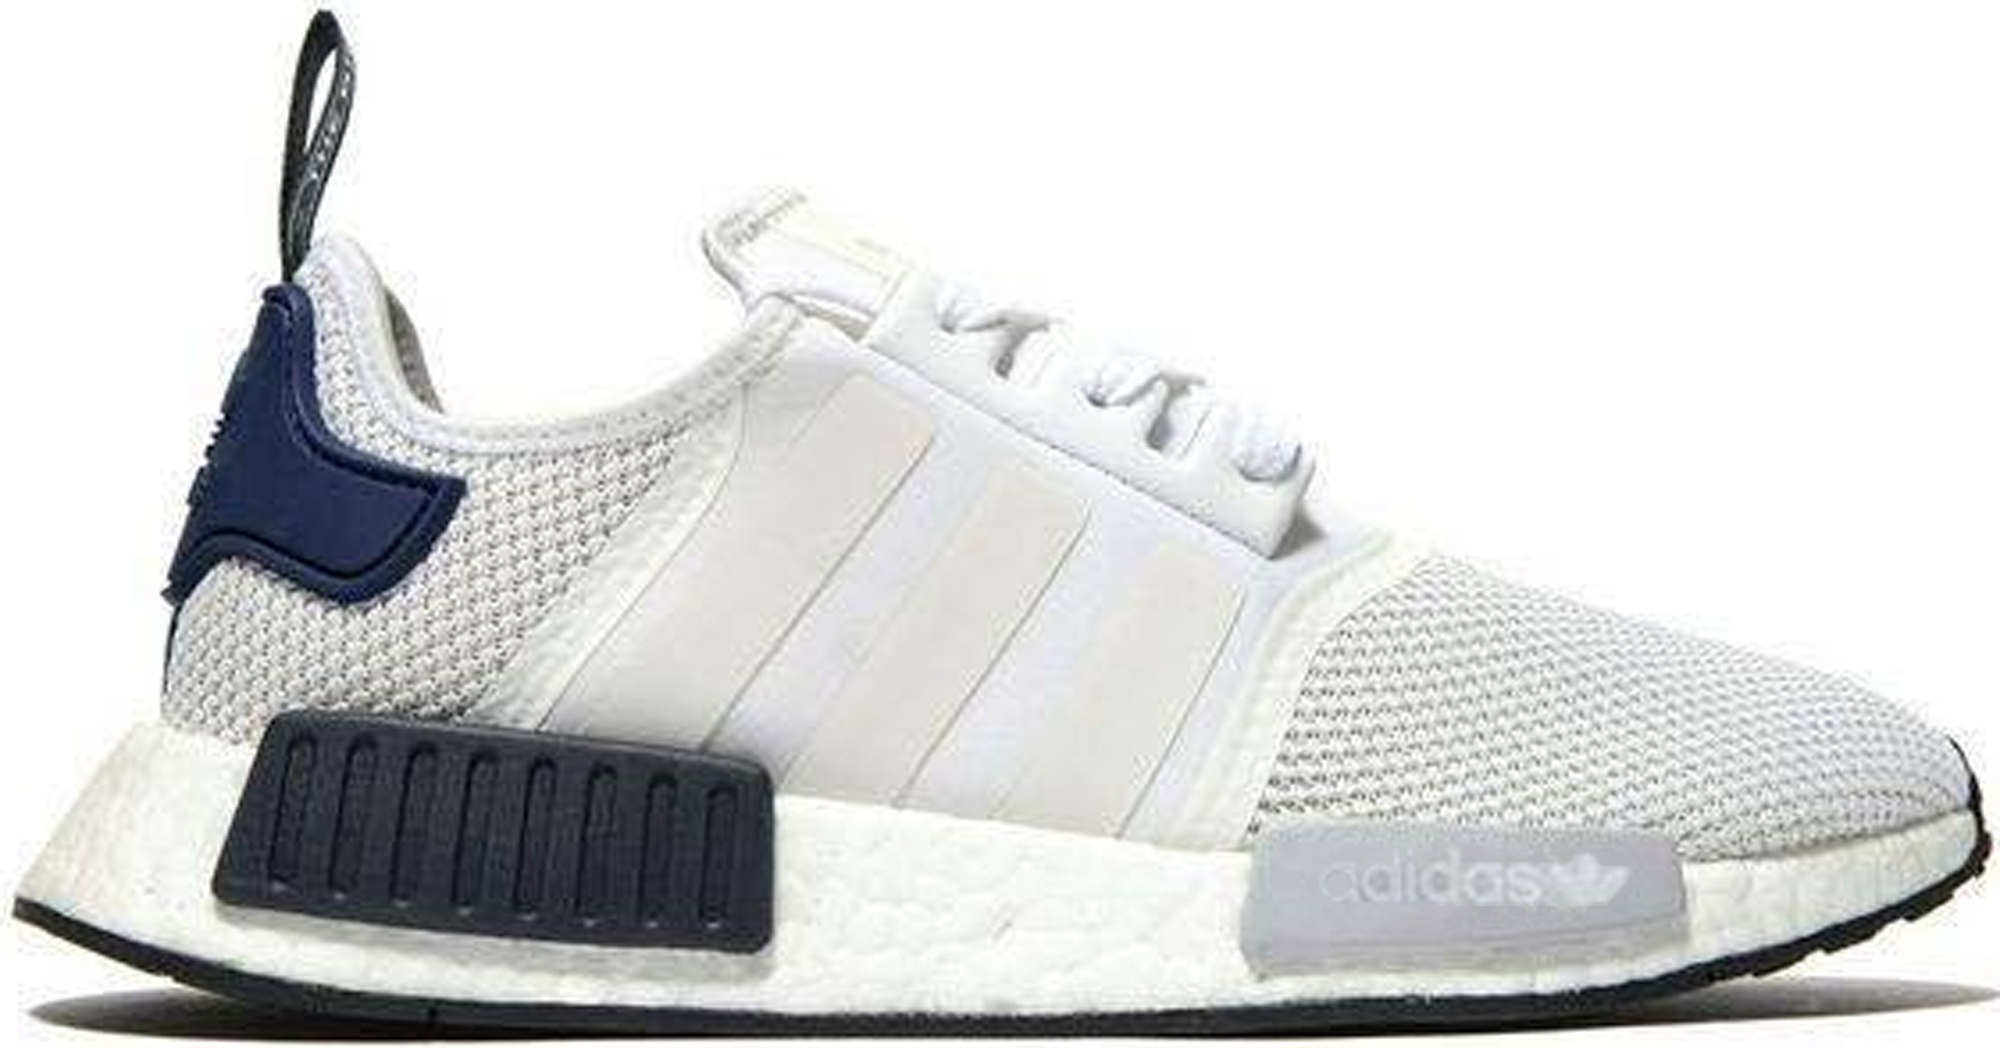 quality design 48a2e 8efc8 ... coming soon adidas nmd r1 white grey black